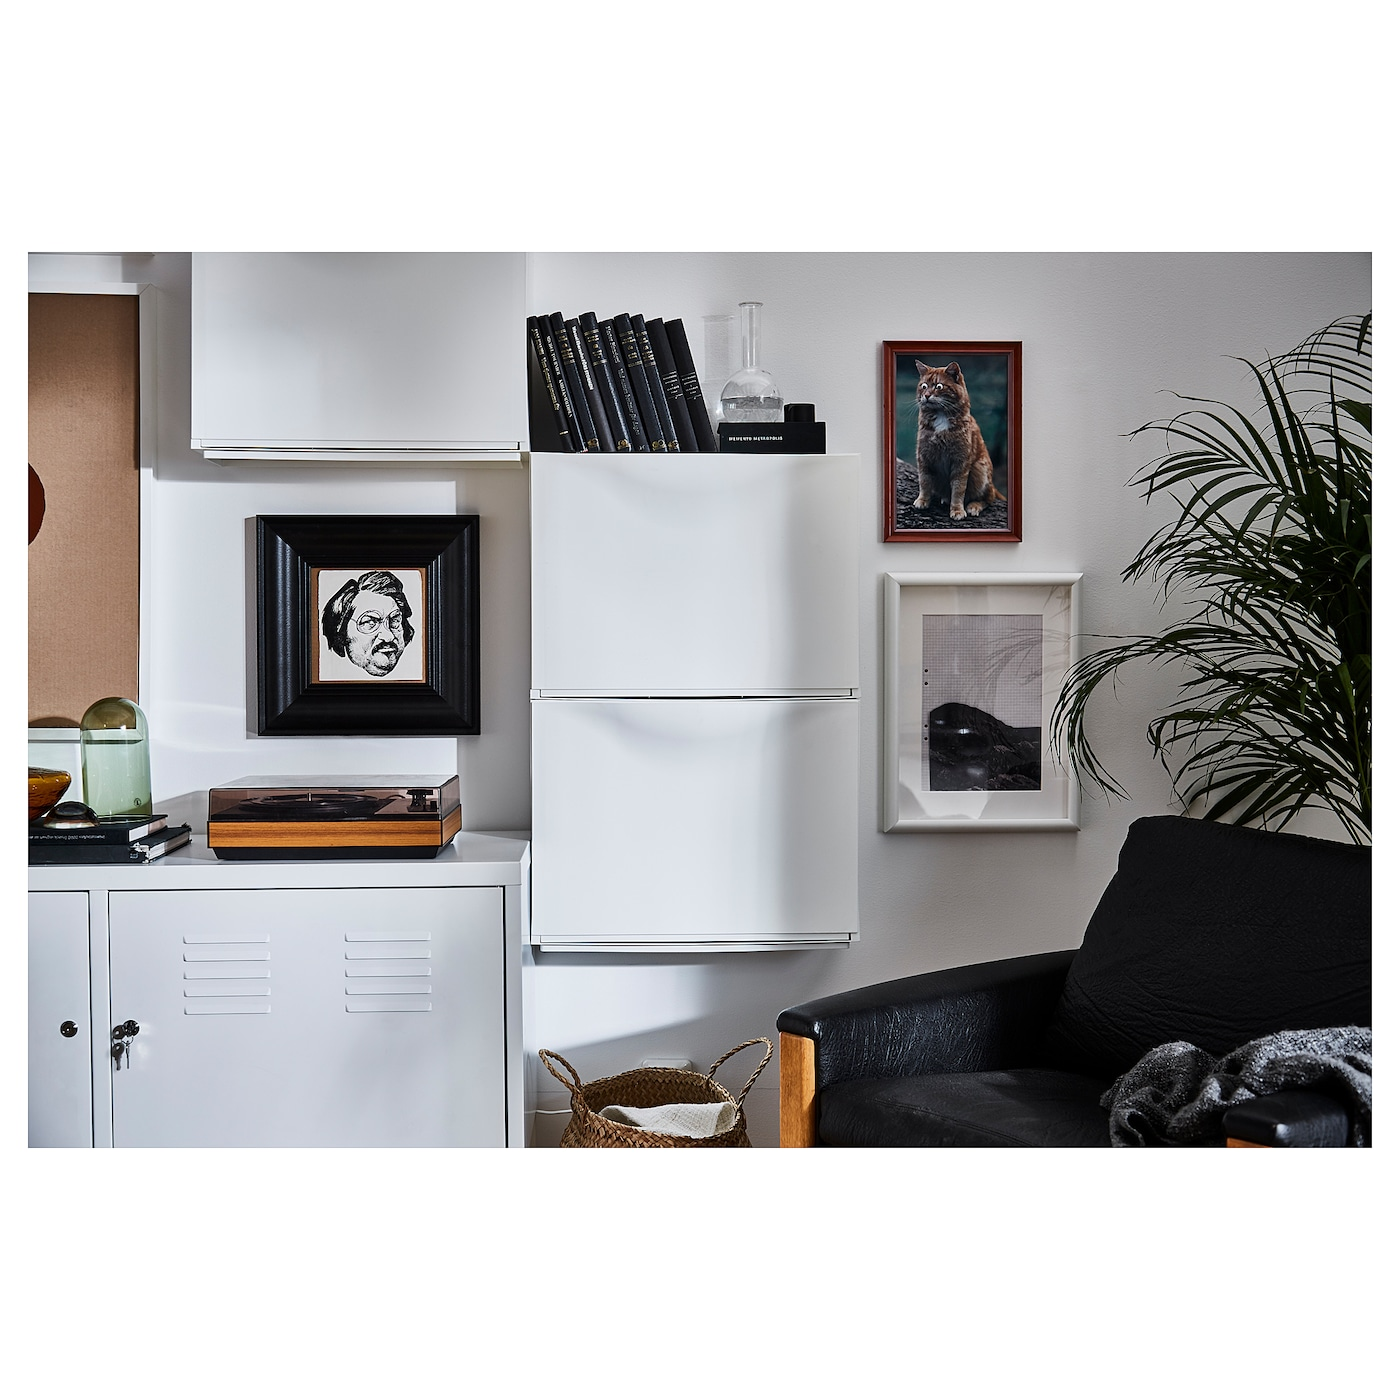 trones shoe cabinet storage white 52 x 39 cm ikea. Black Bedroom Furniture Sets. Home Design Ideas